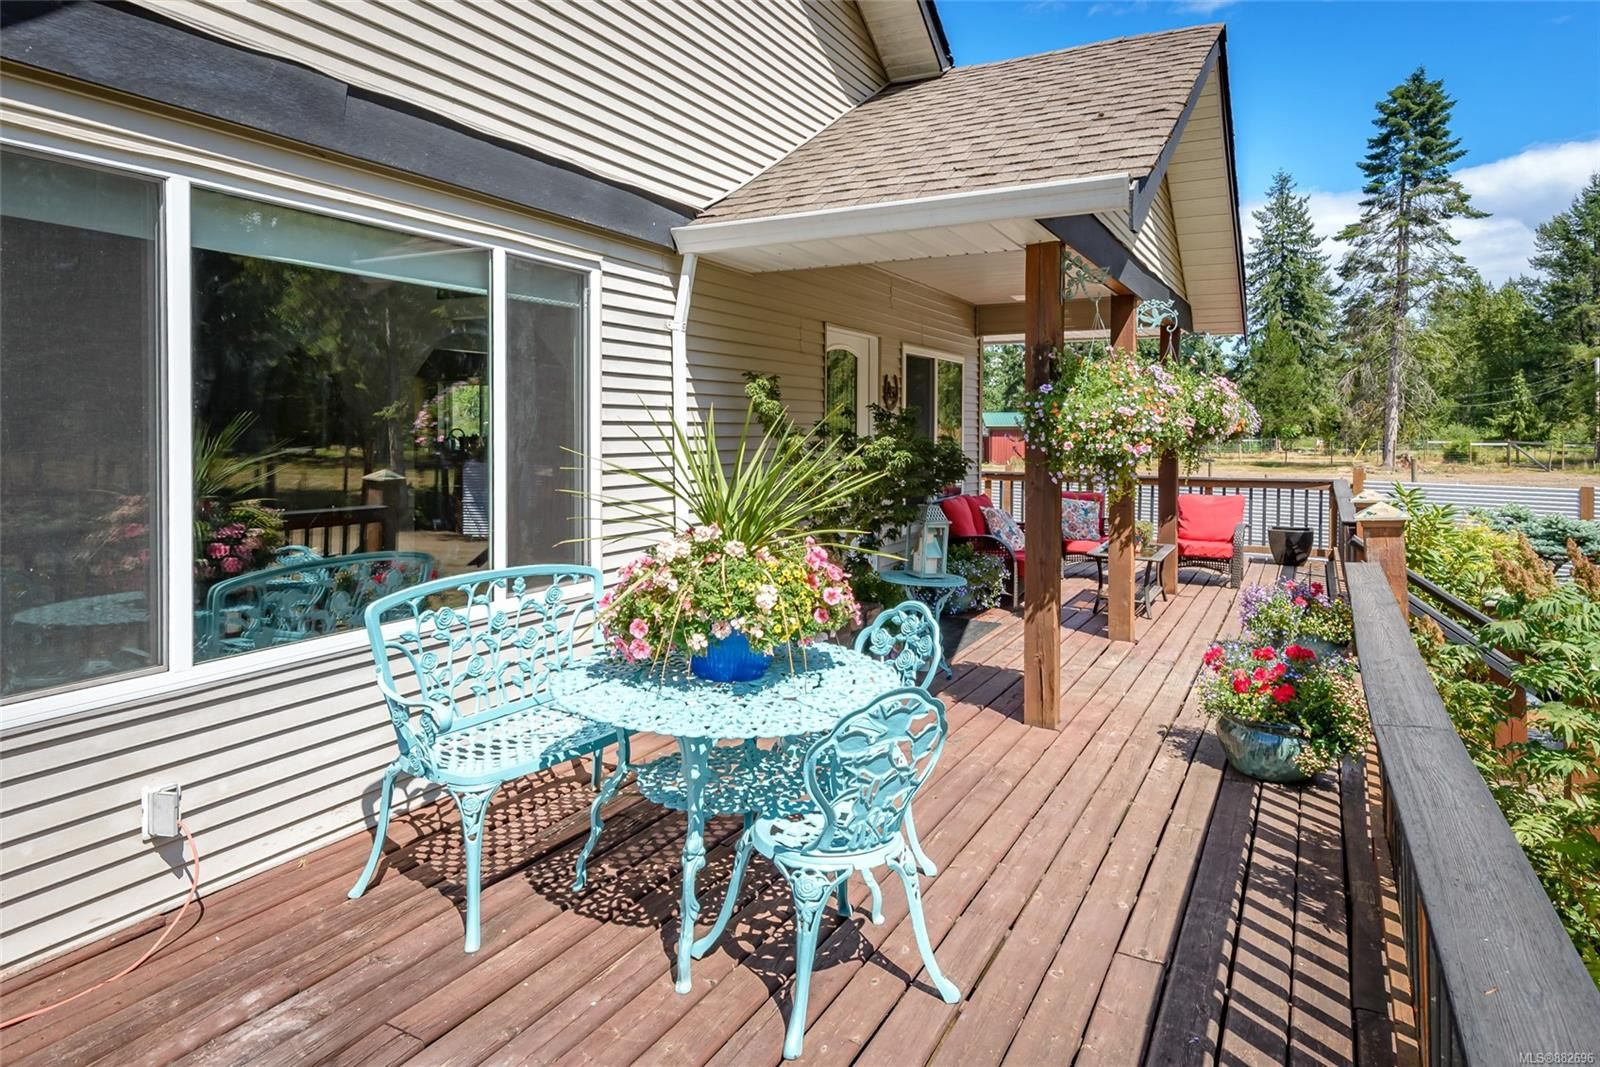 Photo 25: Photos: 3554 MacAulay Rd in : CV Merville Black Creek House for sale (Comox Valley)  : MLS®# 882696